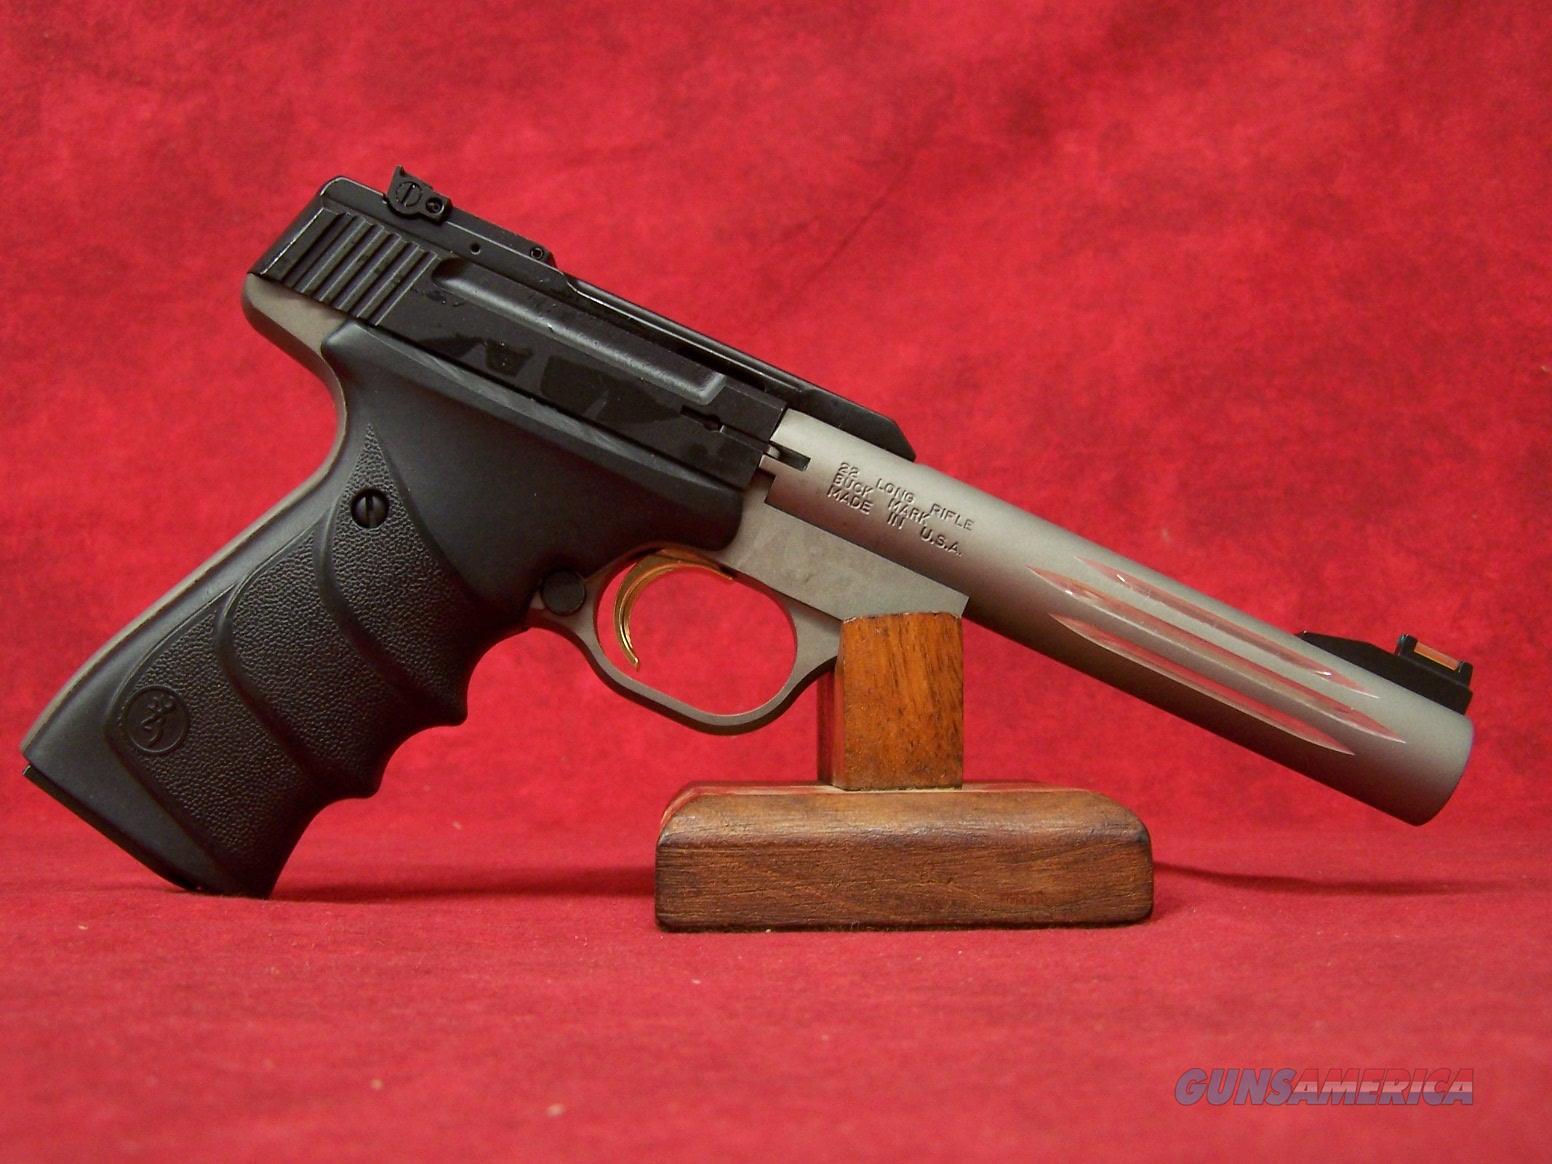 "Browning Buck Mark Plus Lite Gray URX .22LR 5.5"" Barrel (051500490)  Guns > Pistols > Browning Pistols > Buckmark"